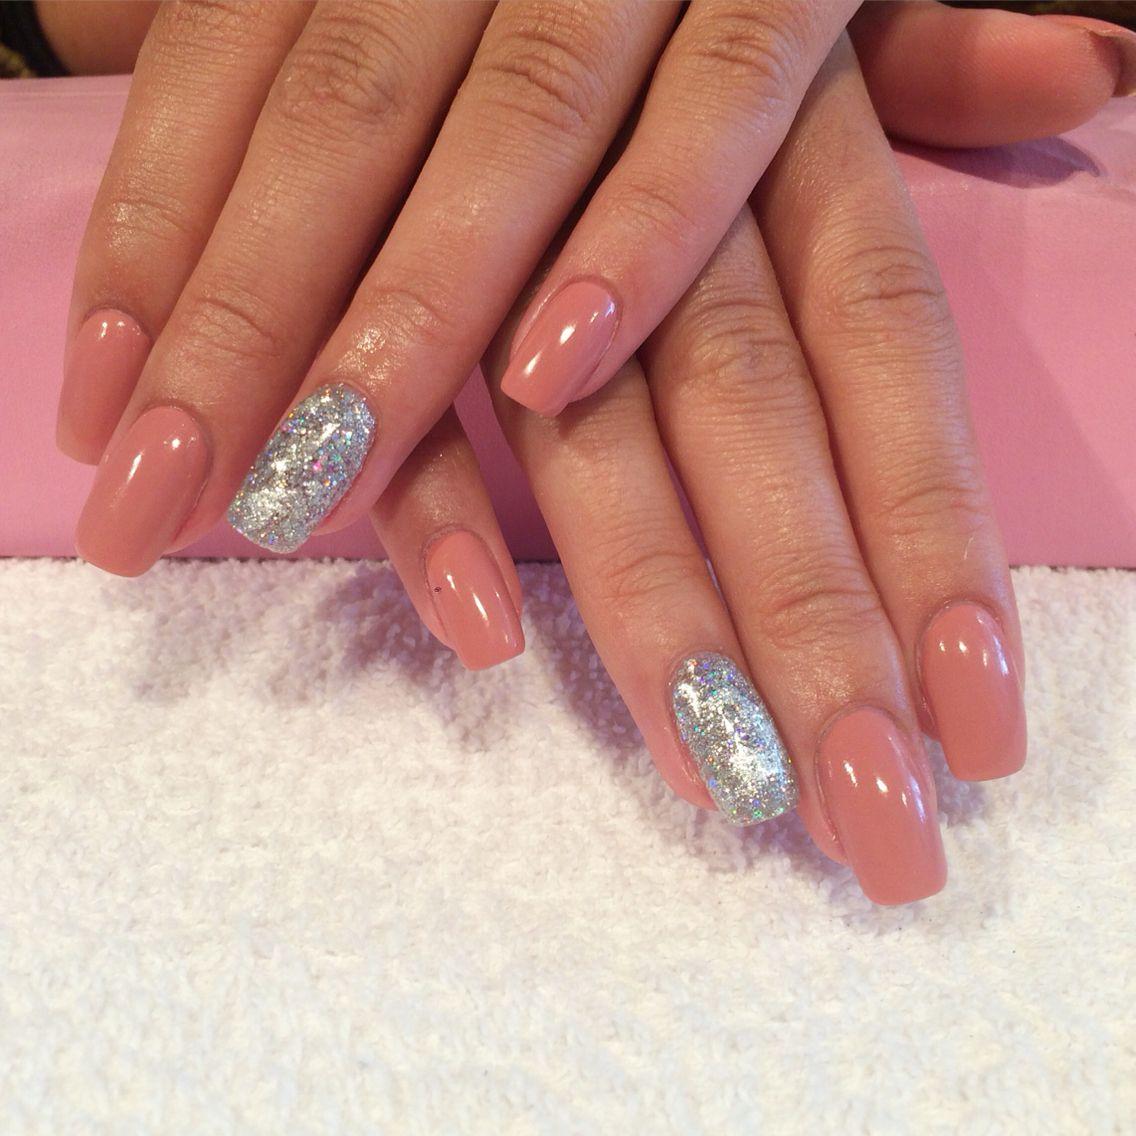 Acrylic nails by Trine done at California Nails #californianails ...